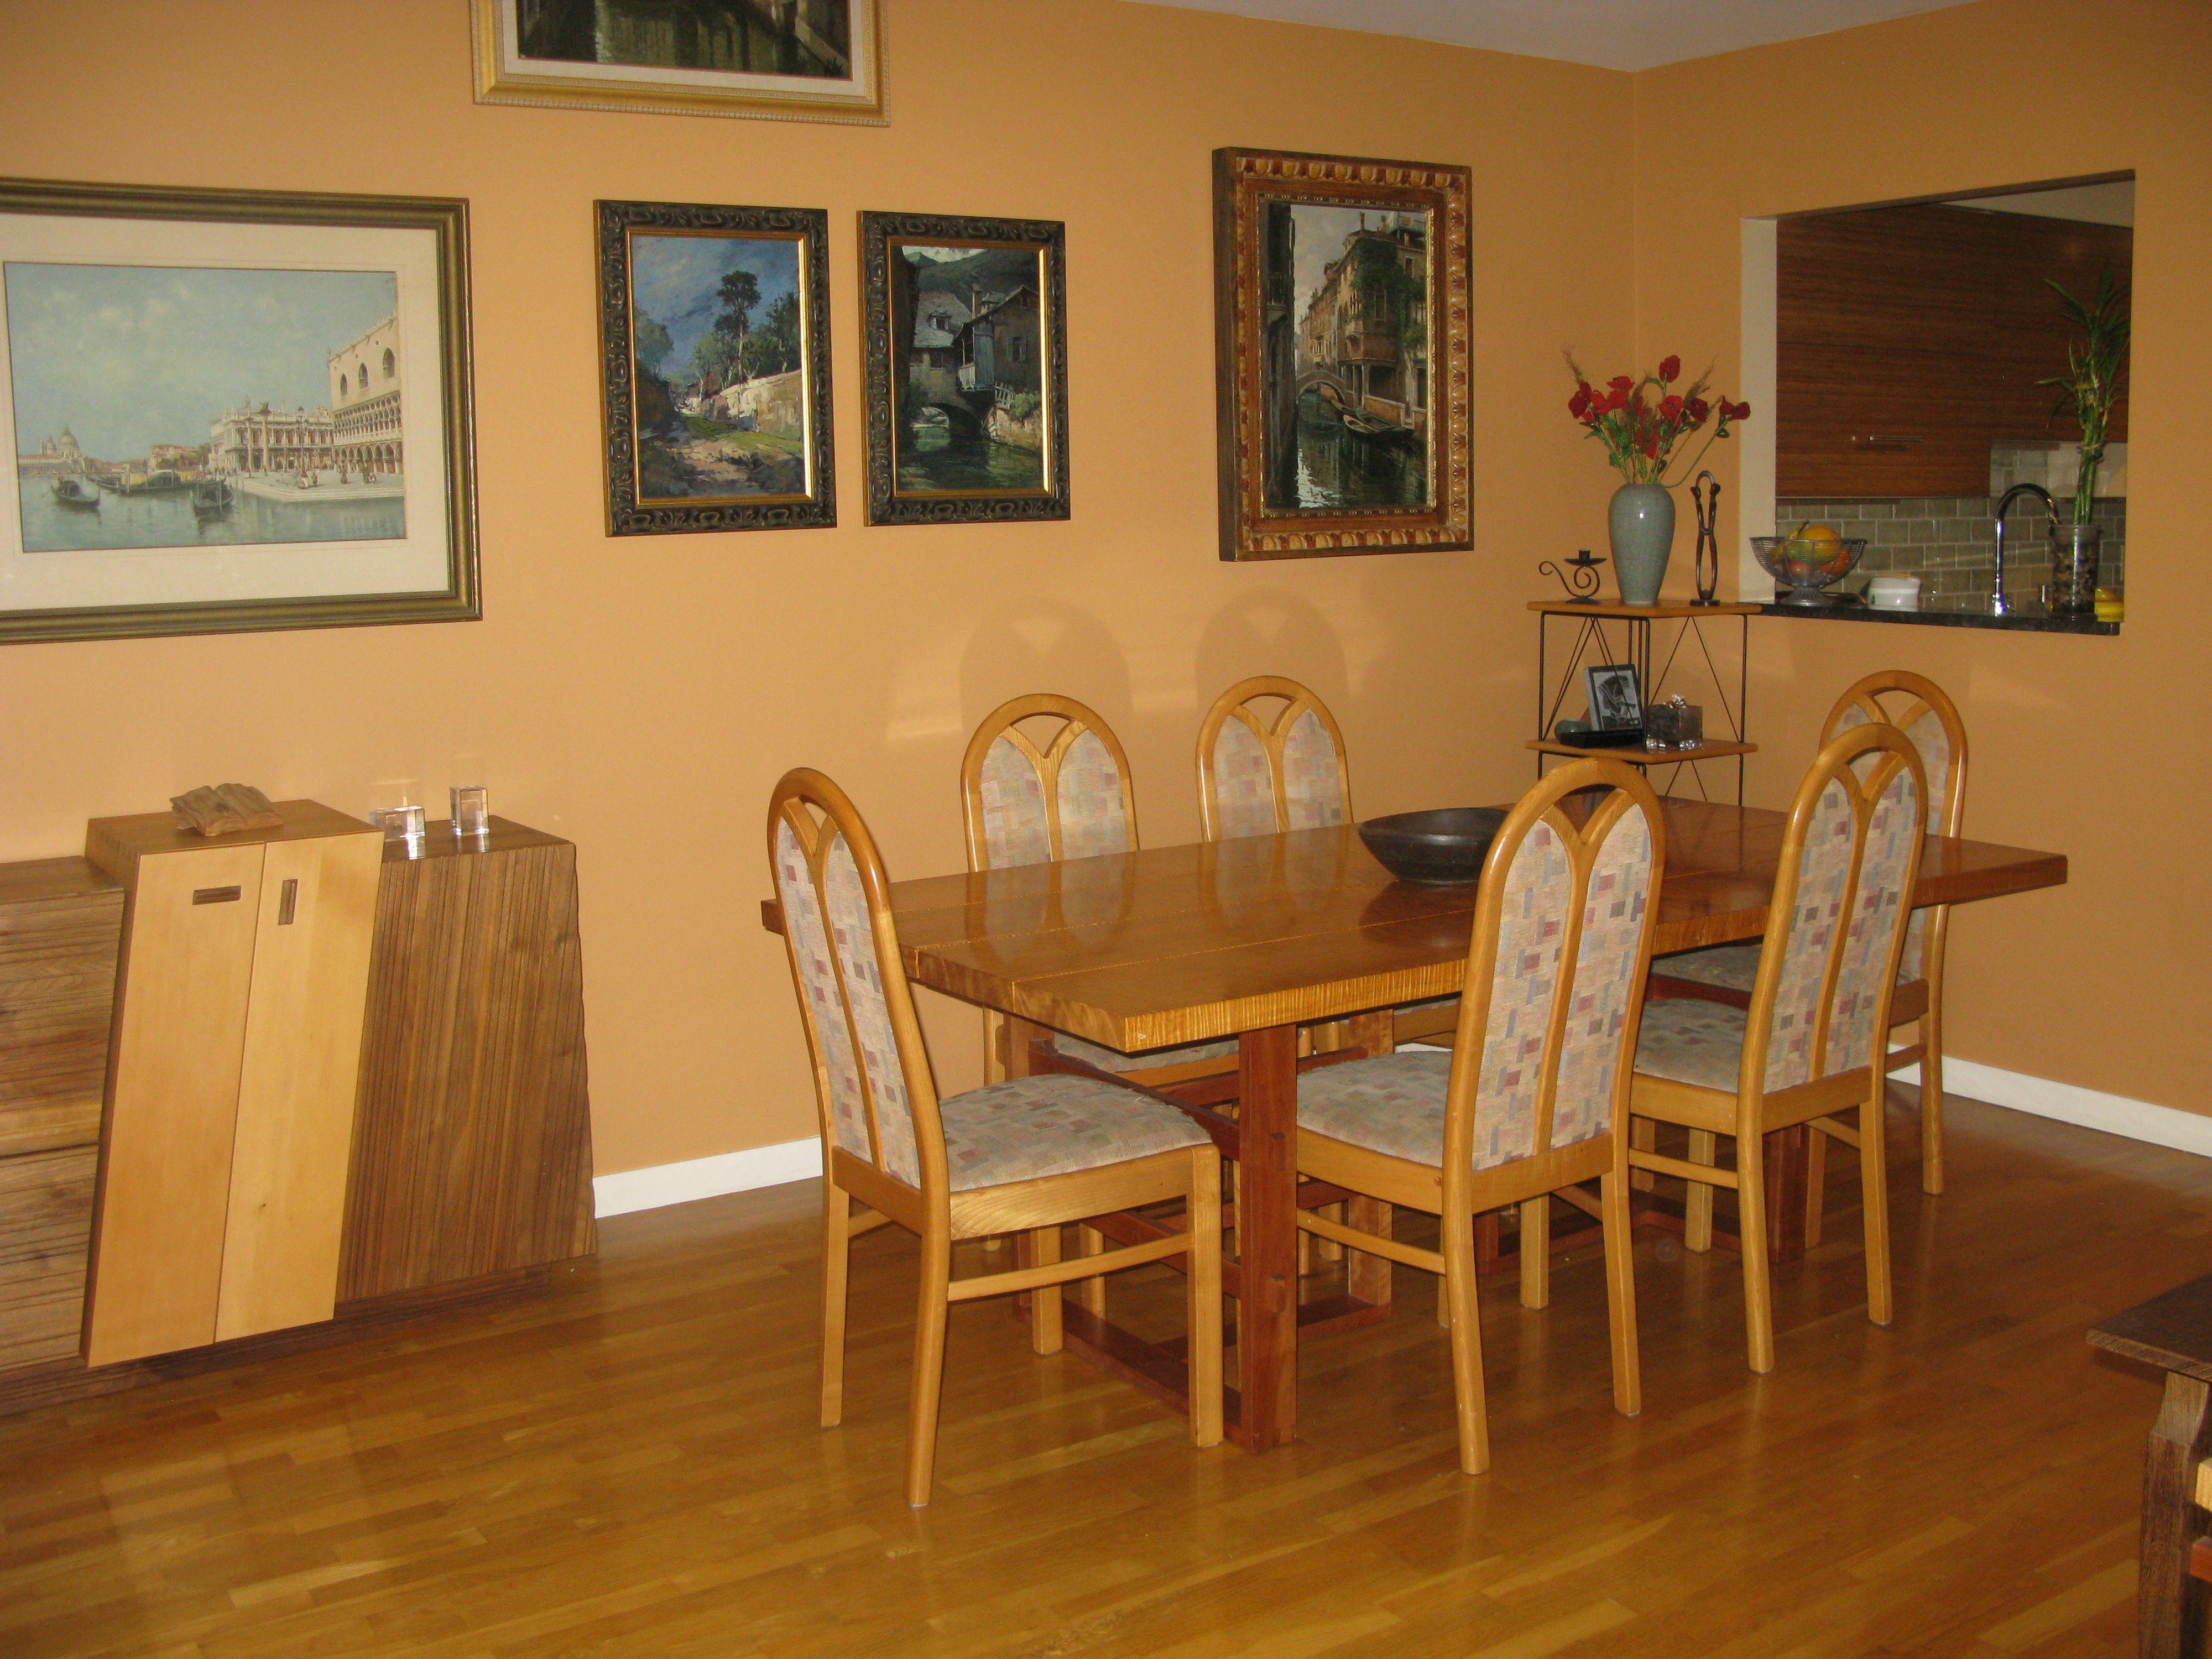 benjamin moore warm sunglow | orange dining | pinterest | benjamin